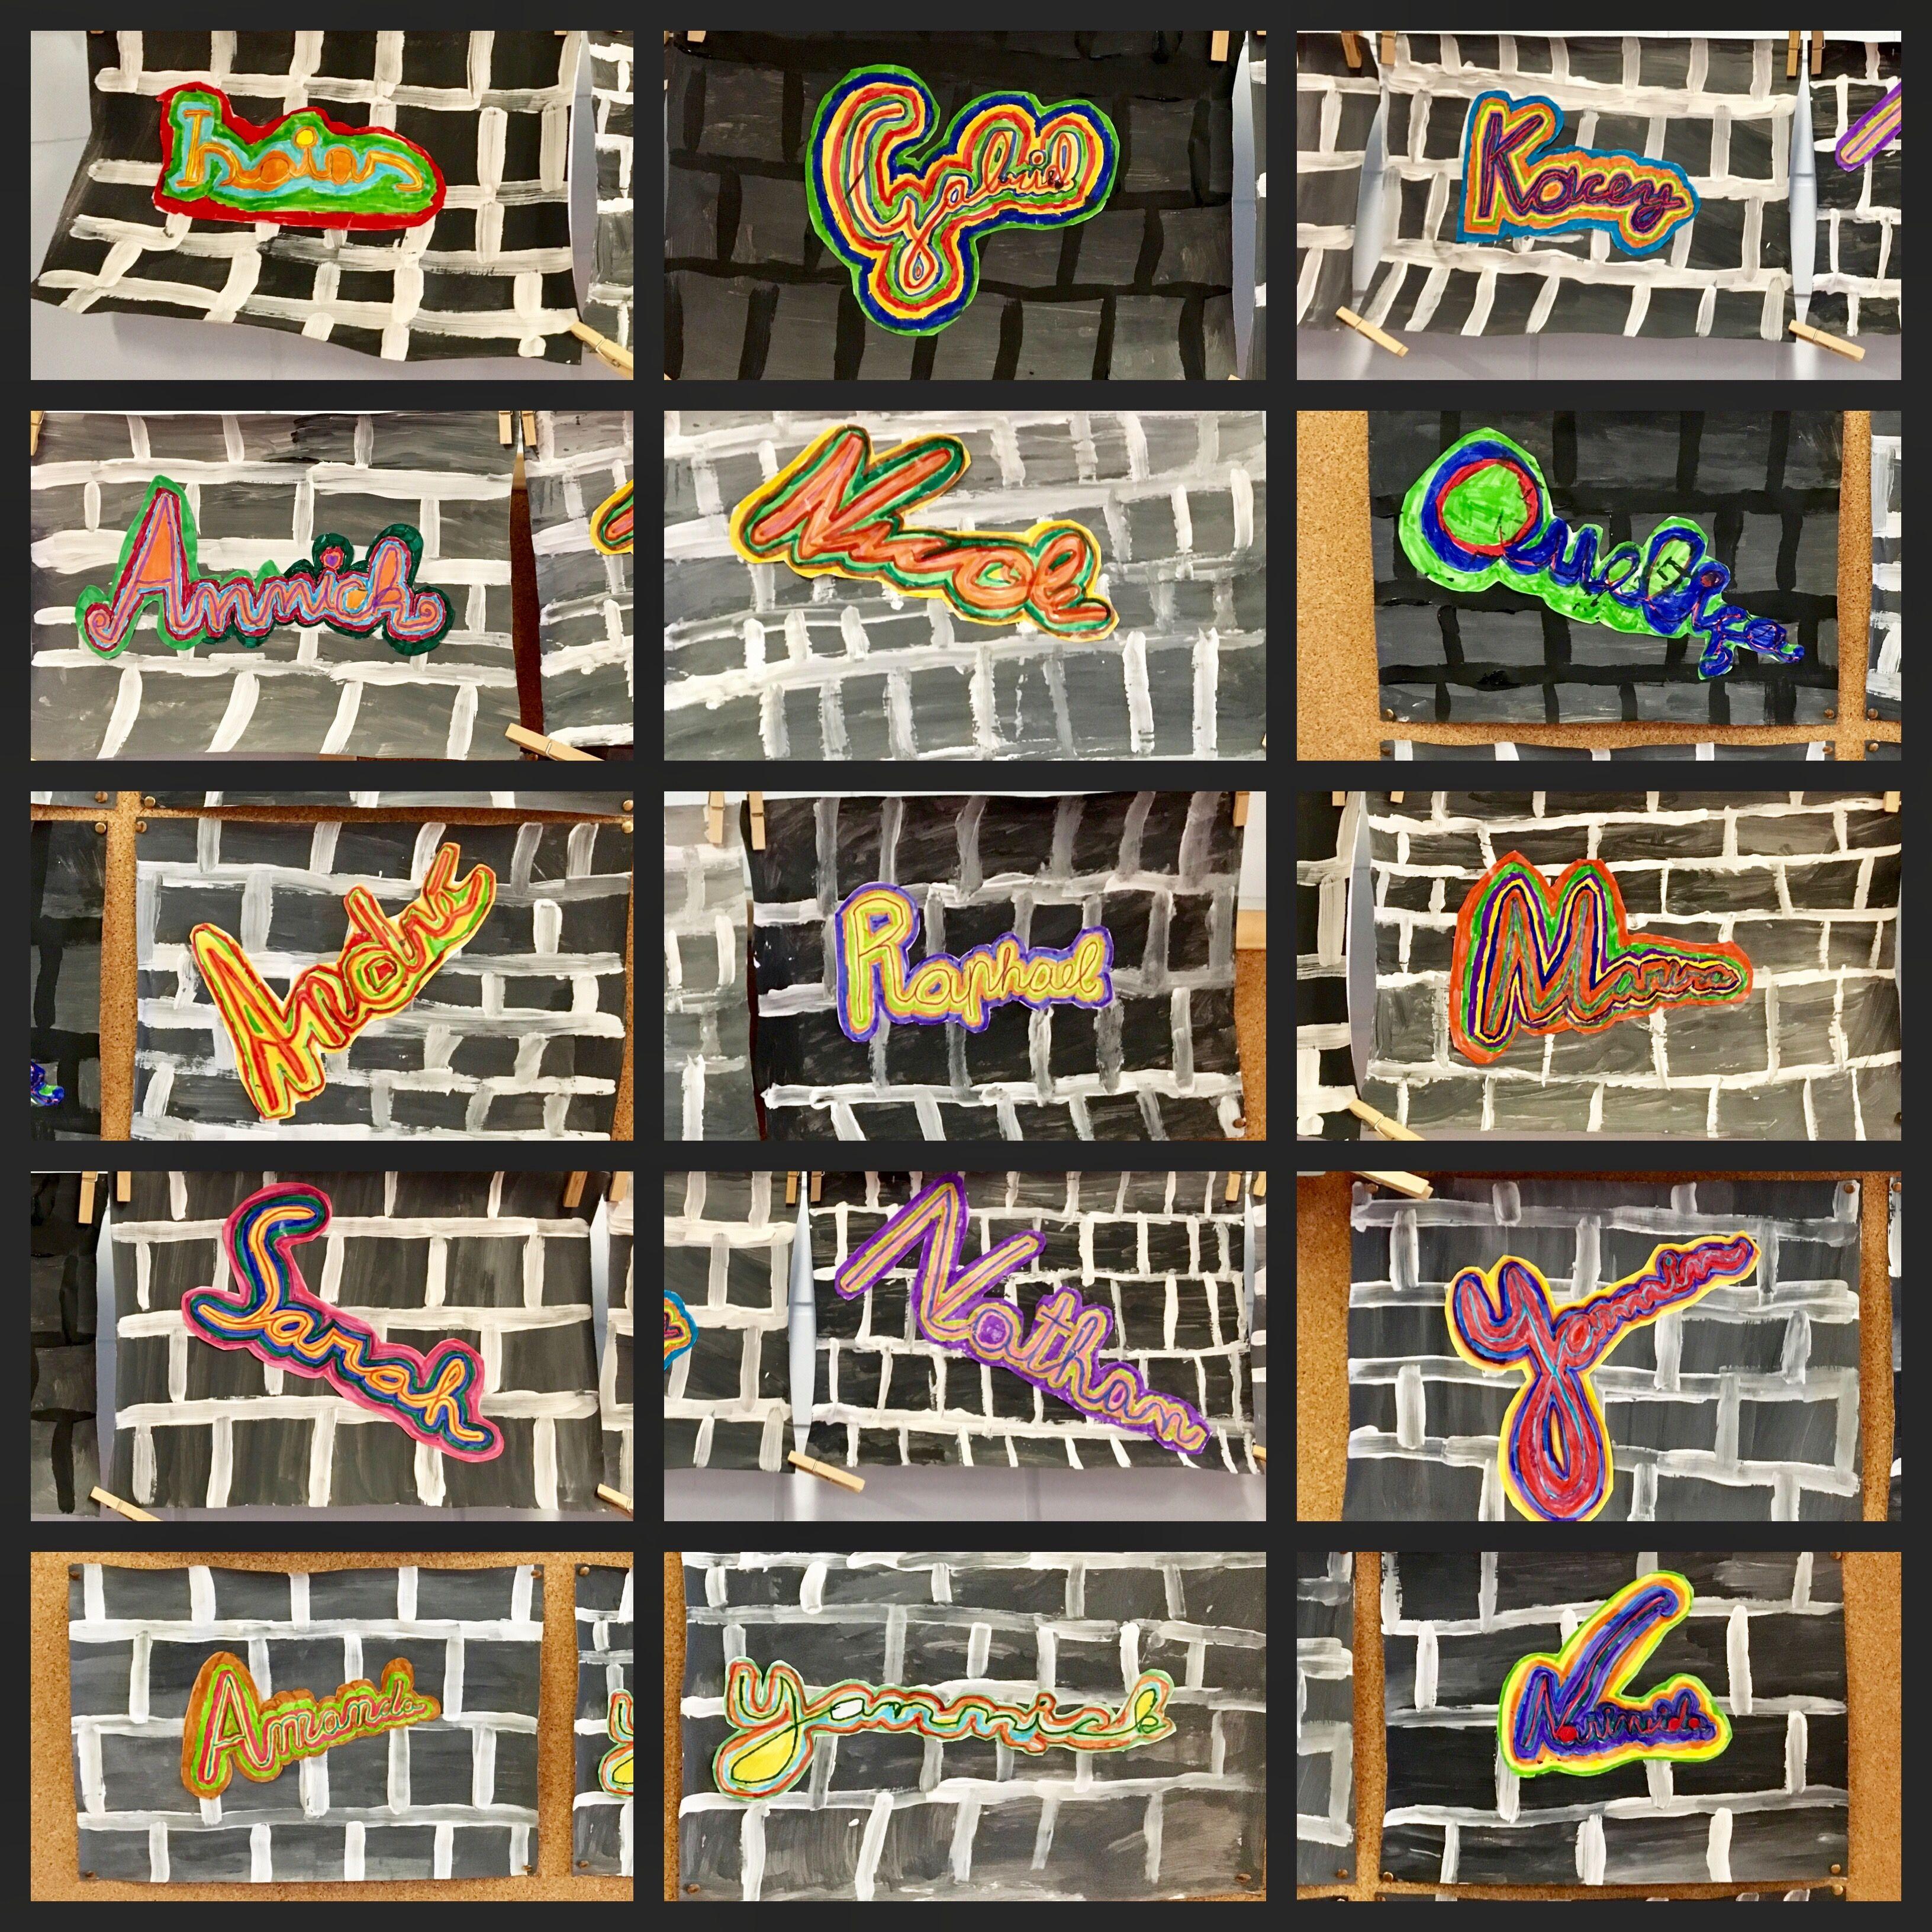 Graffiti Mauer Gemalt Mit Acrylfarbe. Namen In